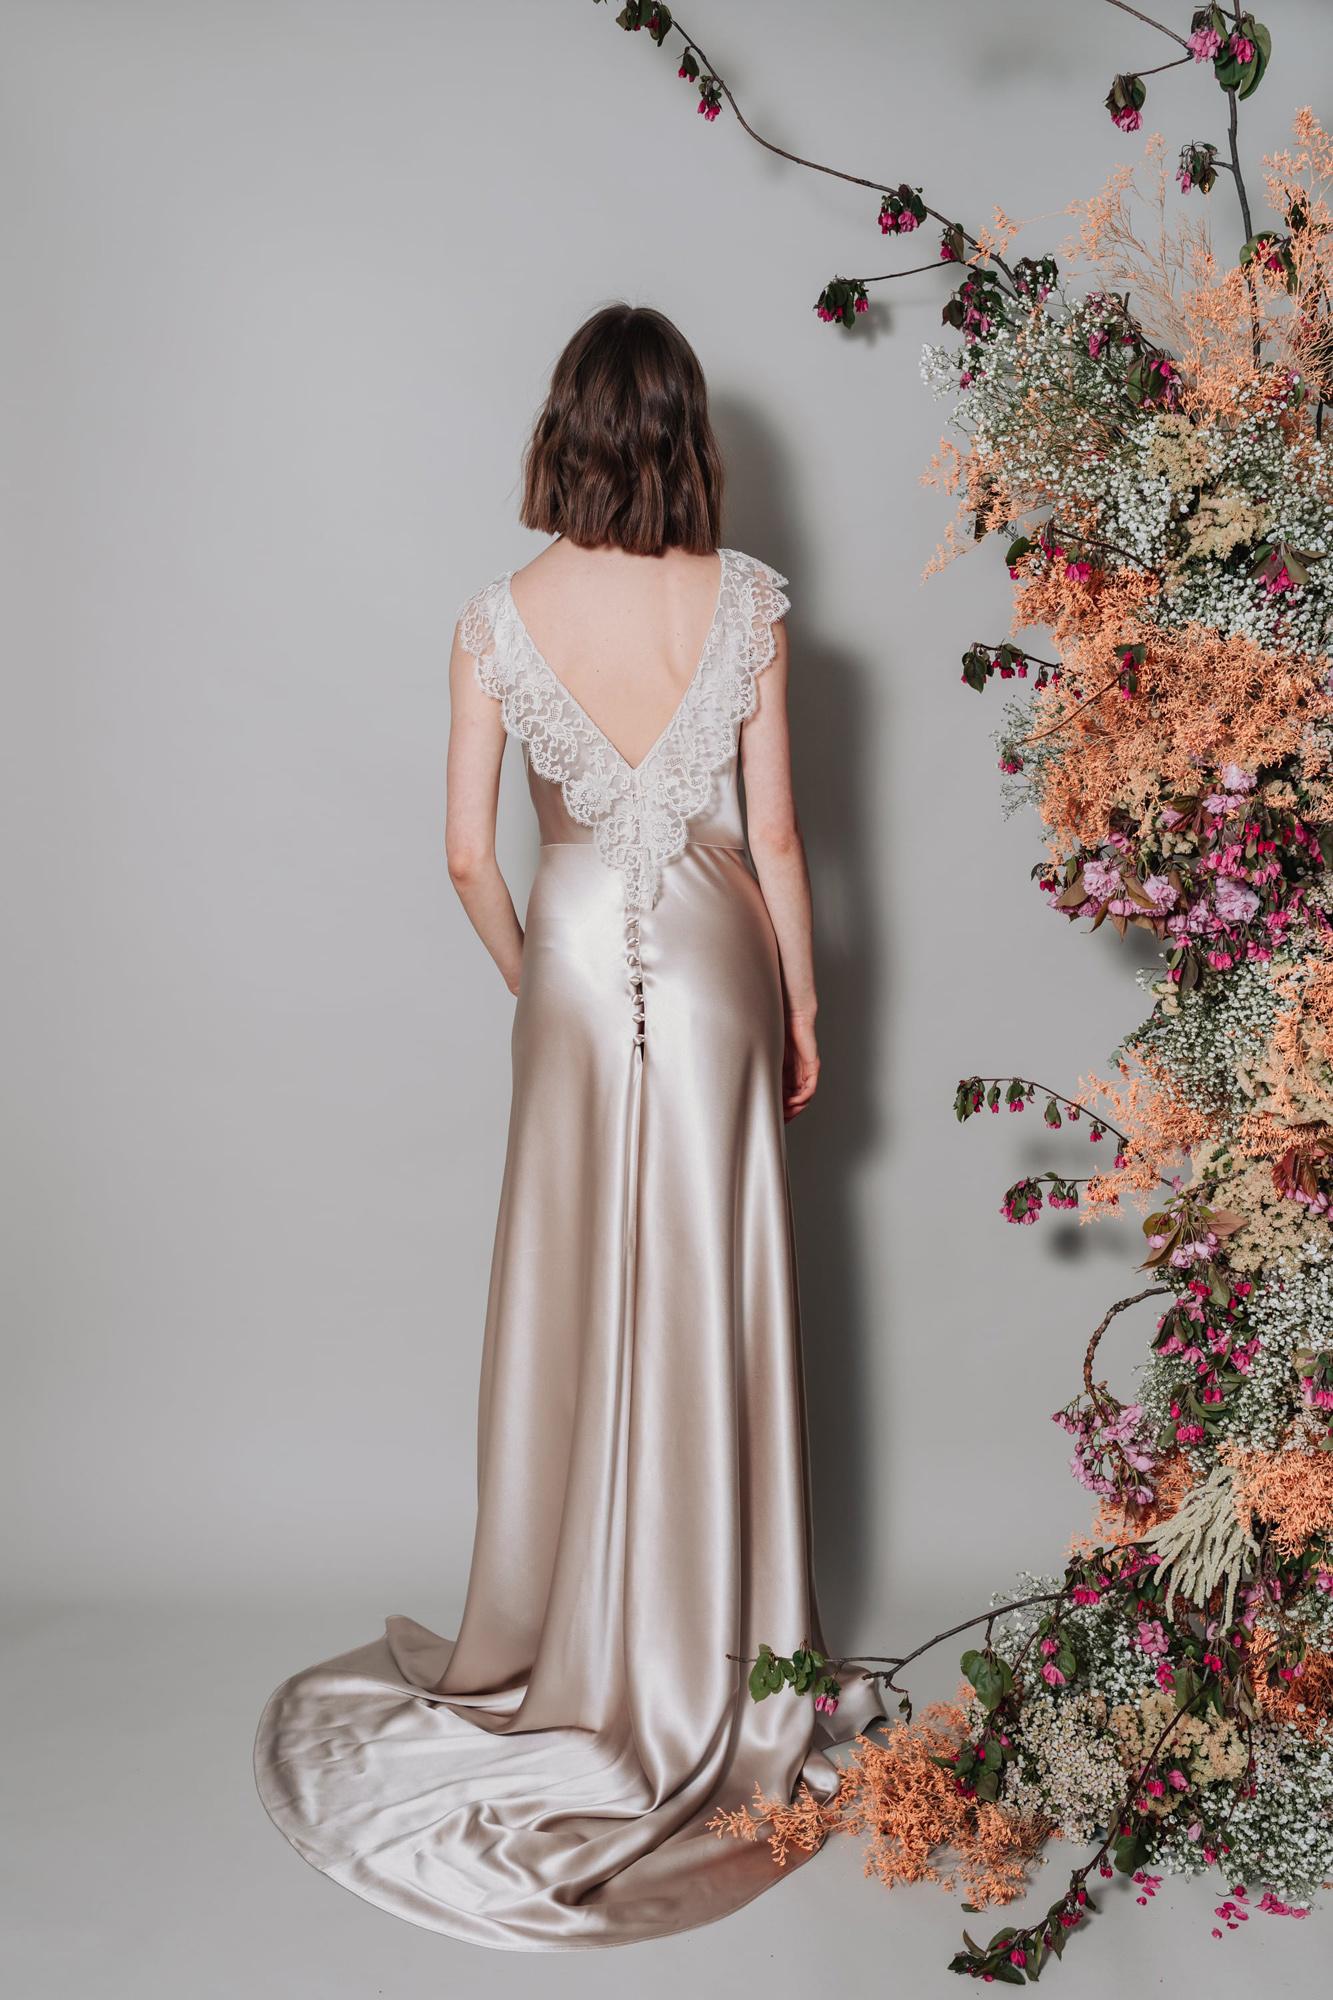 Kate-Beaumont-Sheffield-Honeysuckle-Bias-Cut-Silk-Panelled-Wedding-Gown-13.jpg